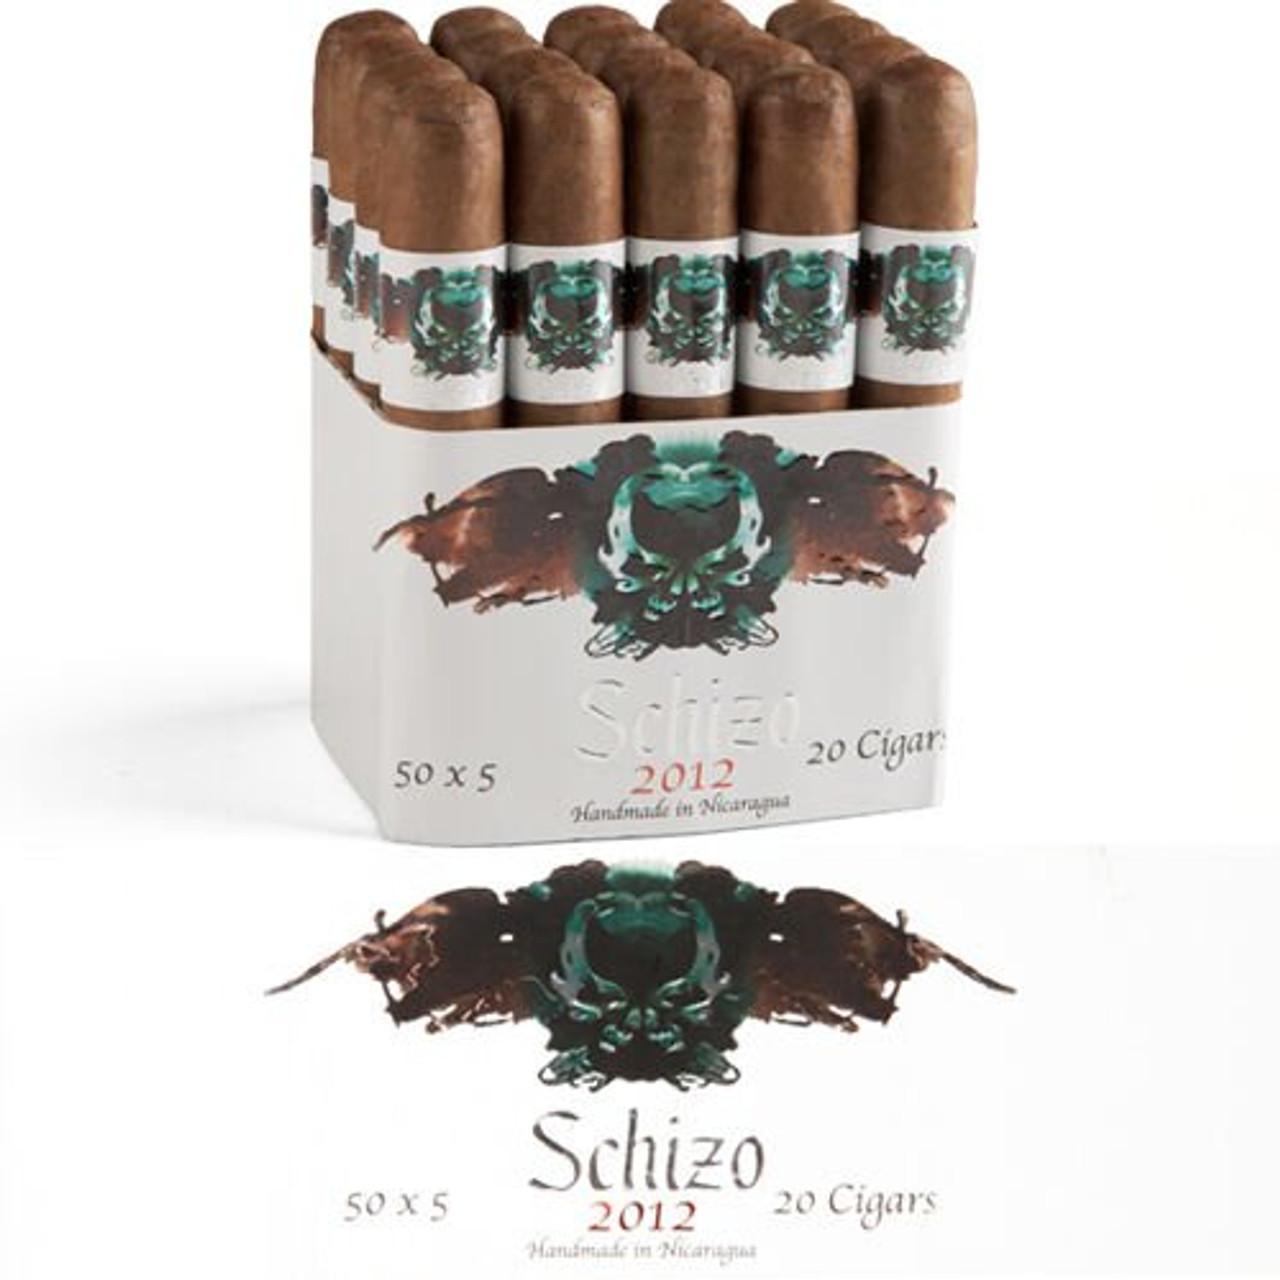 Asylum Schizo 5 X 50 Maduro Cigars - 5 x 50 (Bundle of 20)